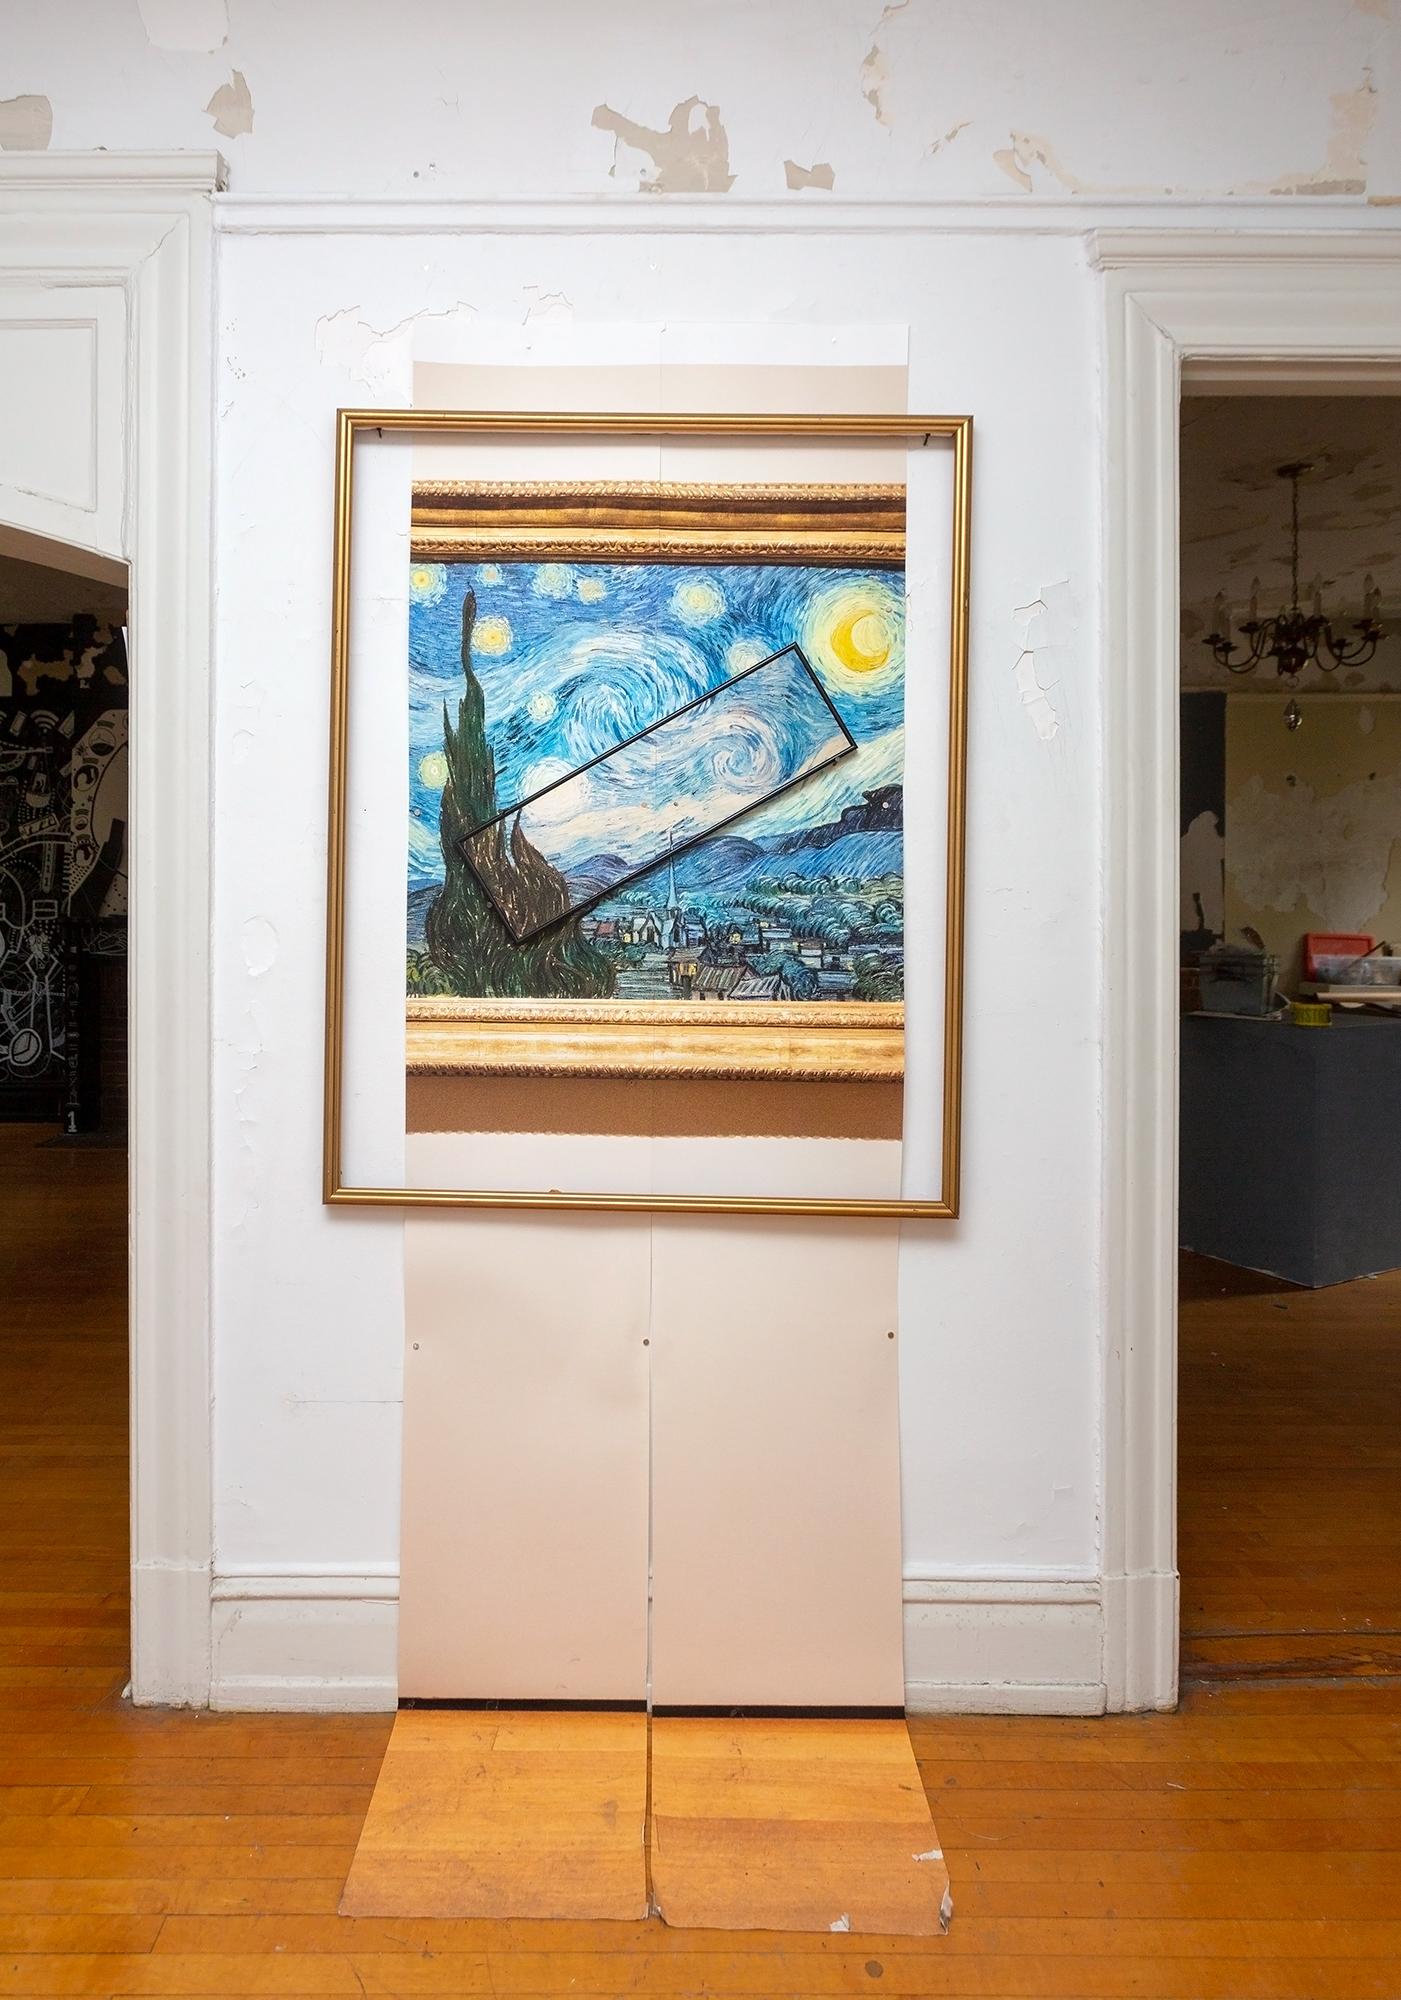 Installation at Governor's Island Art Fair, Governor's Island, NY. 2018